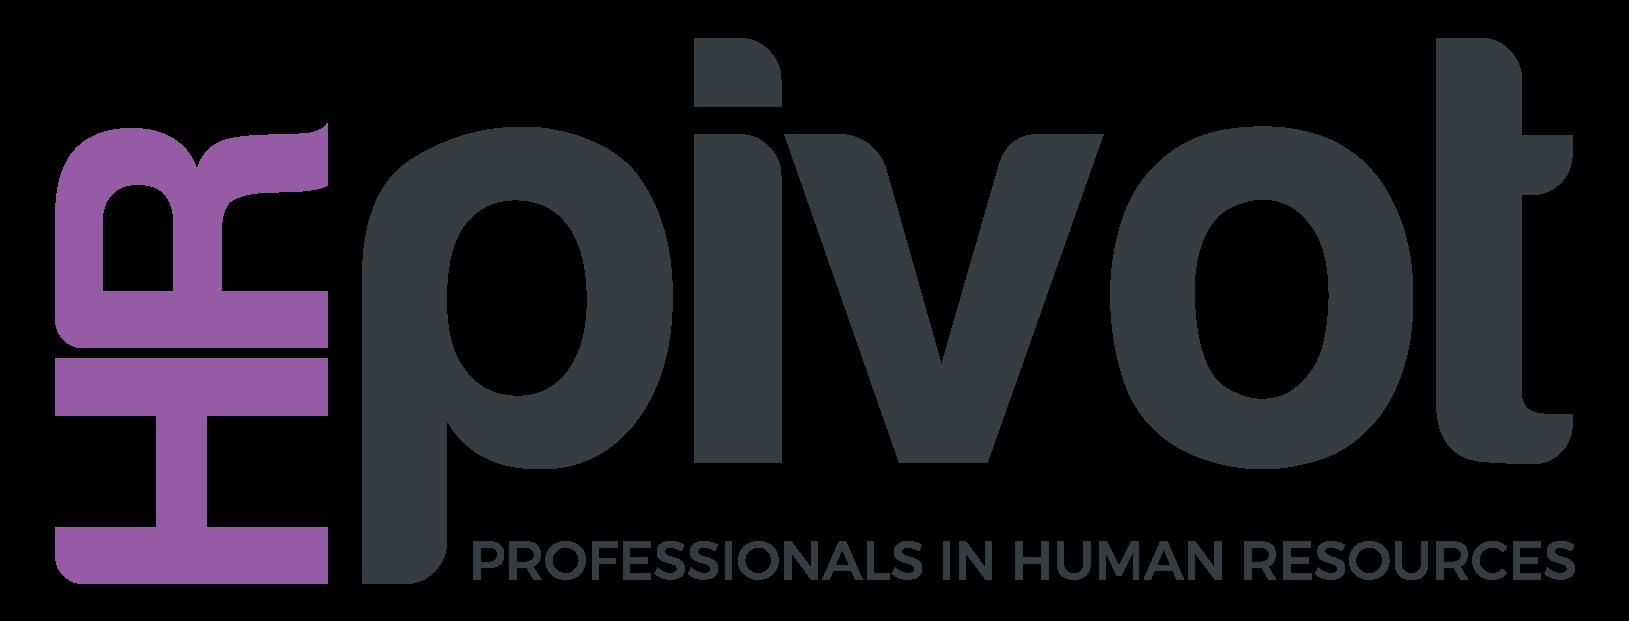 Cashier - HRPivot - Career Page